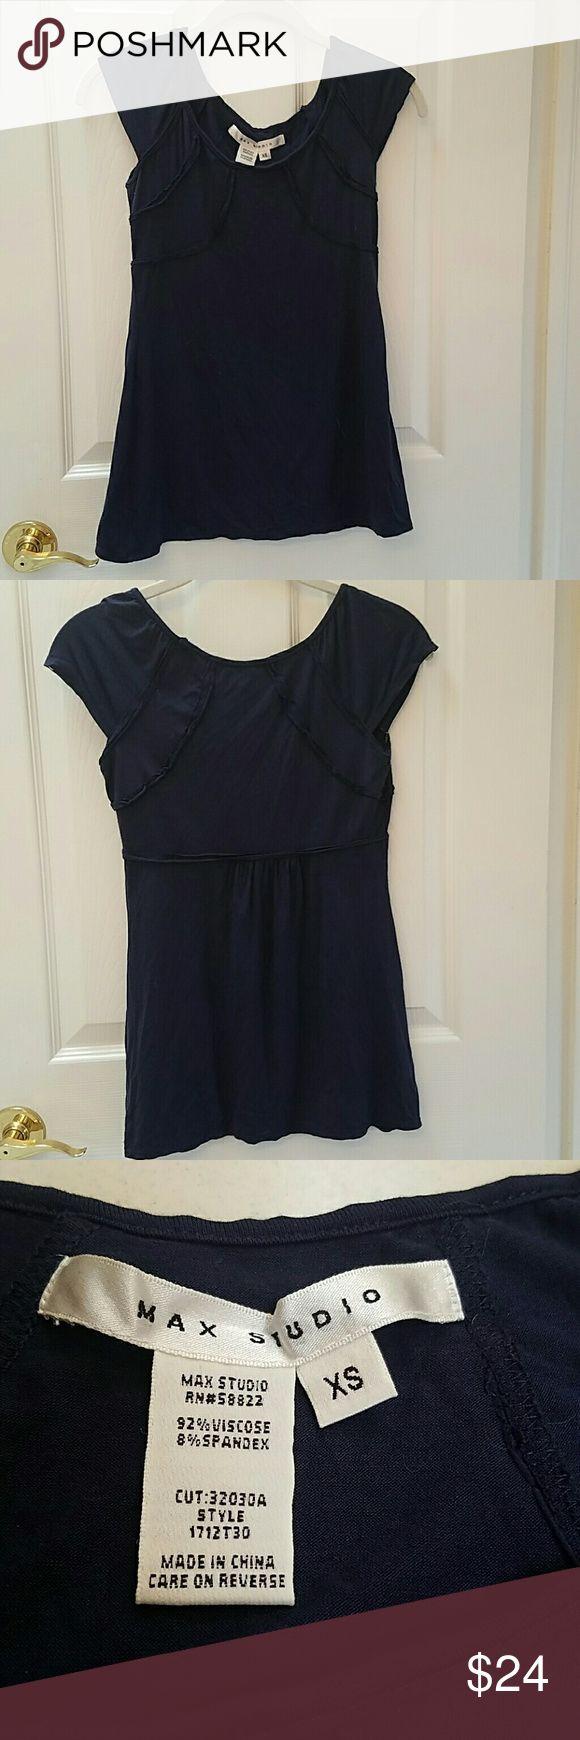 Max Studio navy short sleeve top. XS Max Studio navy short sleeve top. XS. Soft & comfy. A perfect navy blue wardrobe staple. Excellent condition. Max Studio Tops